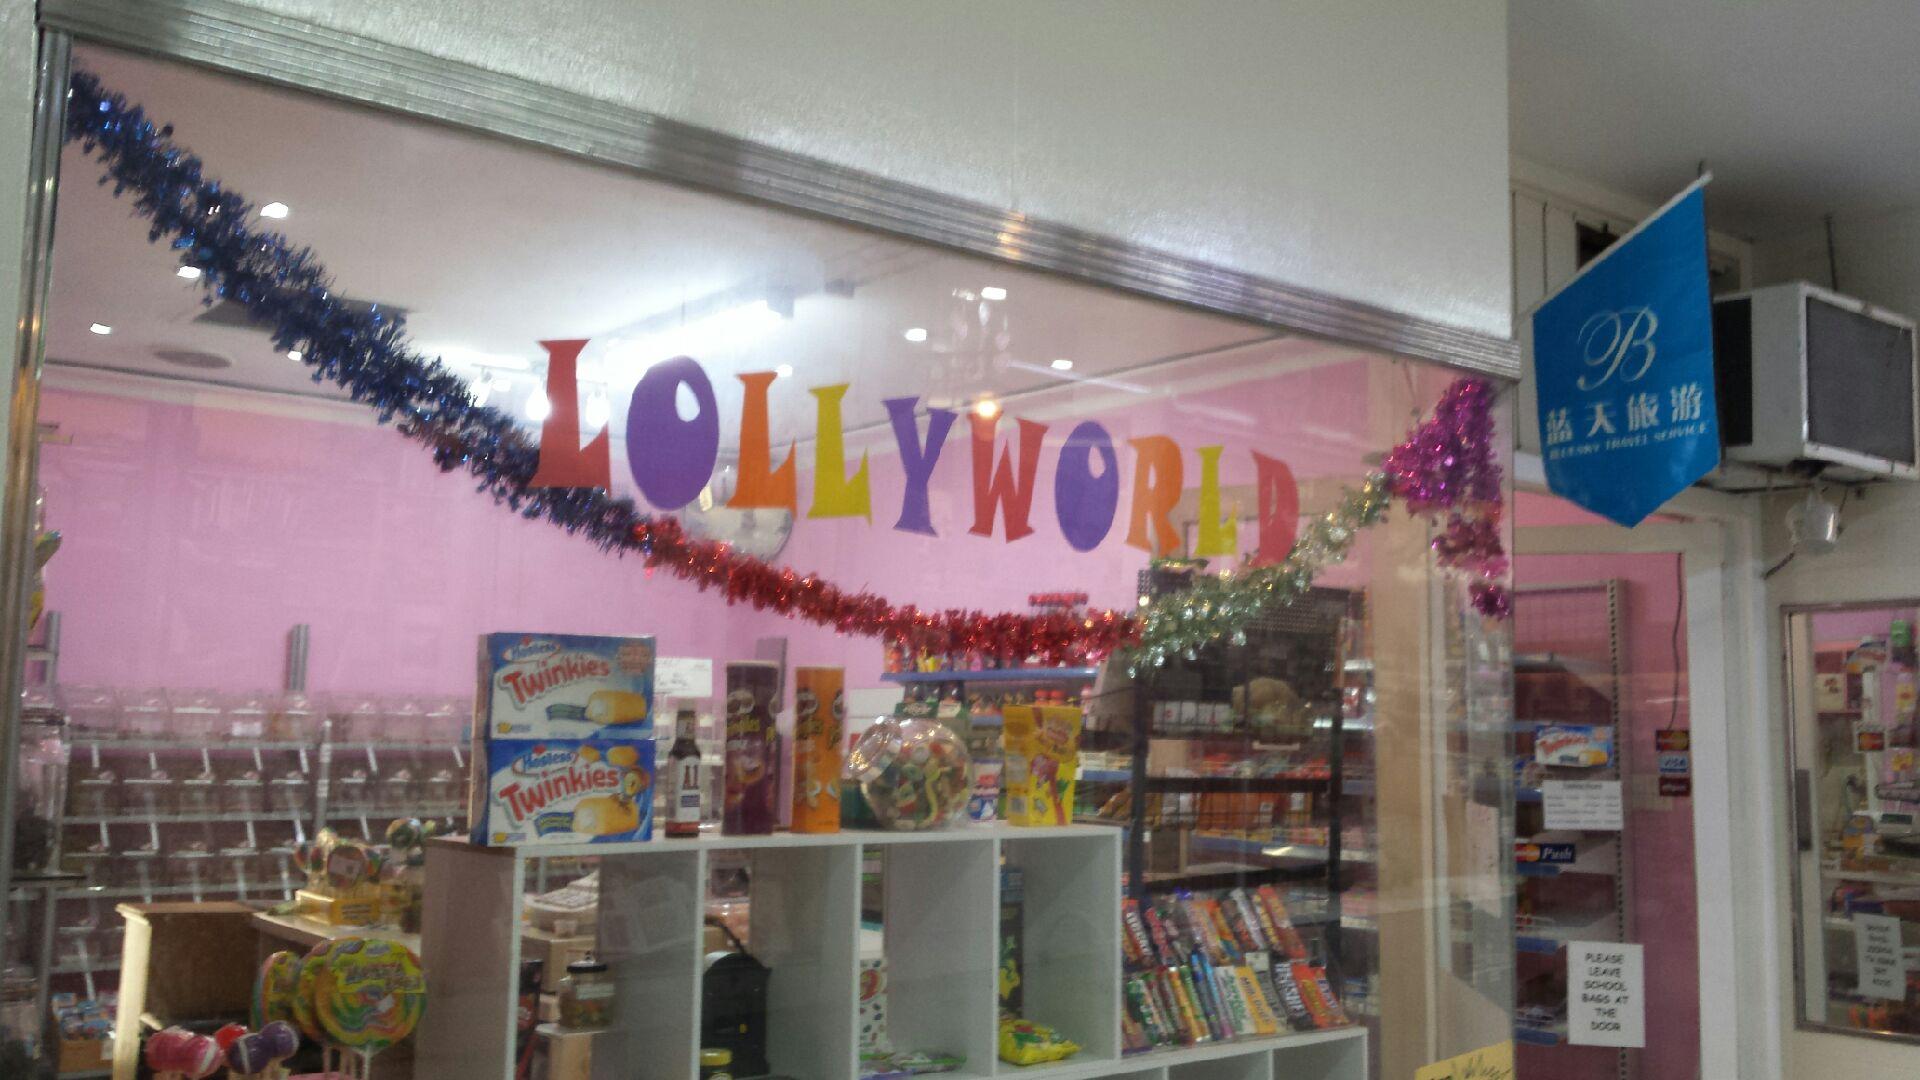 LollyWorld